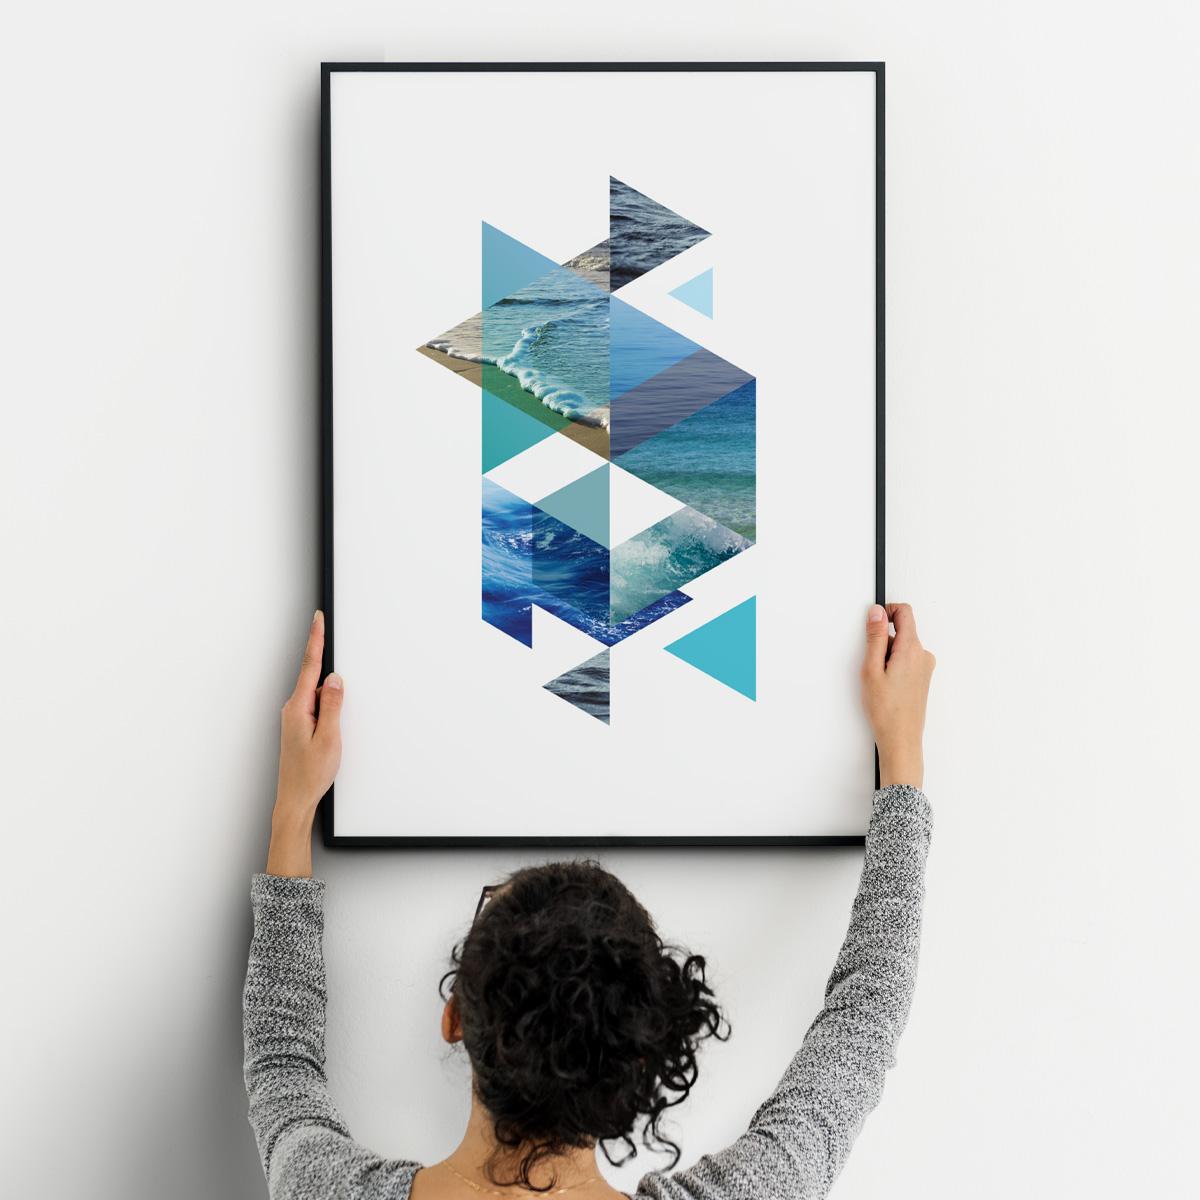 Ocean-X-Agon #03